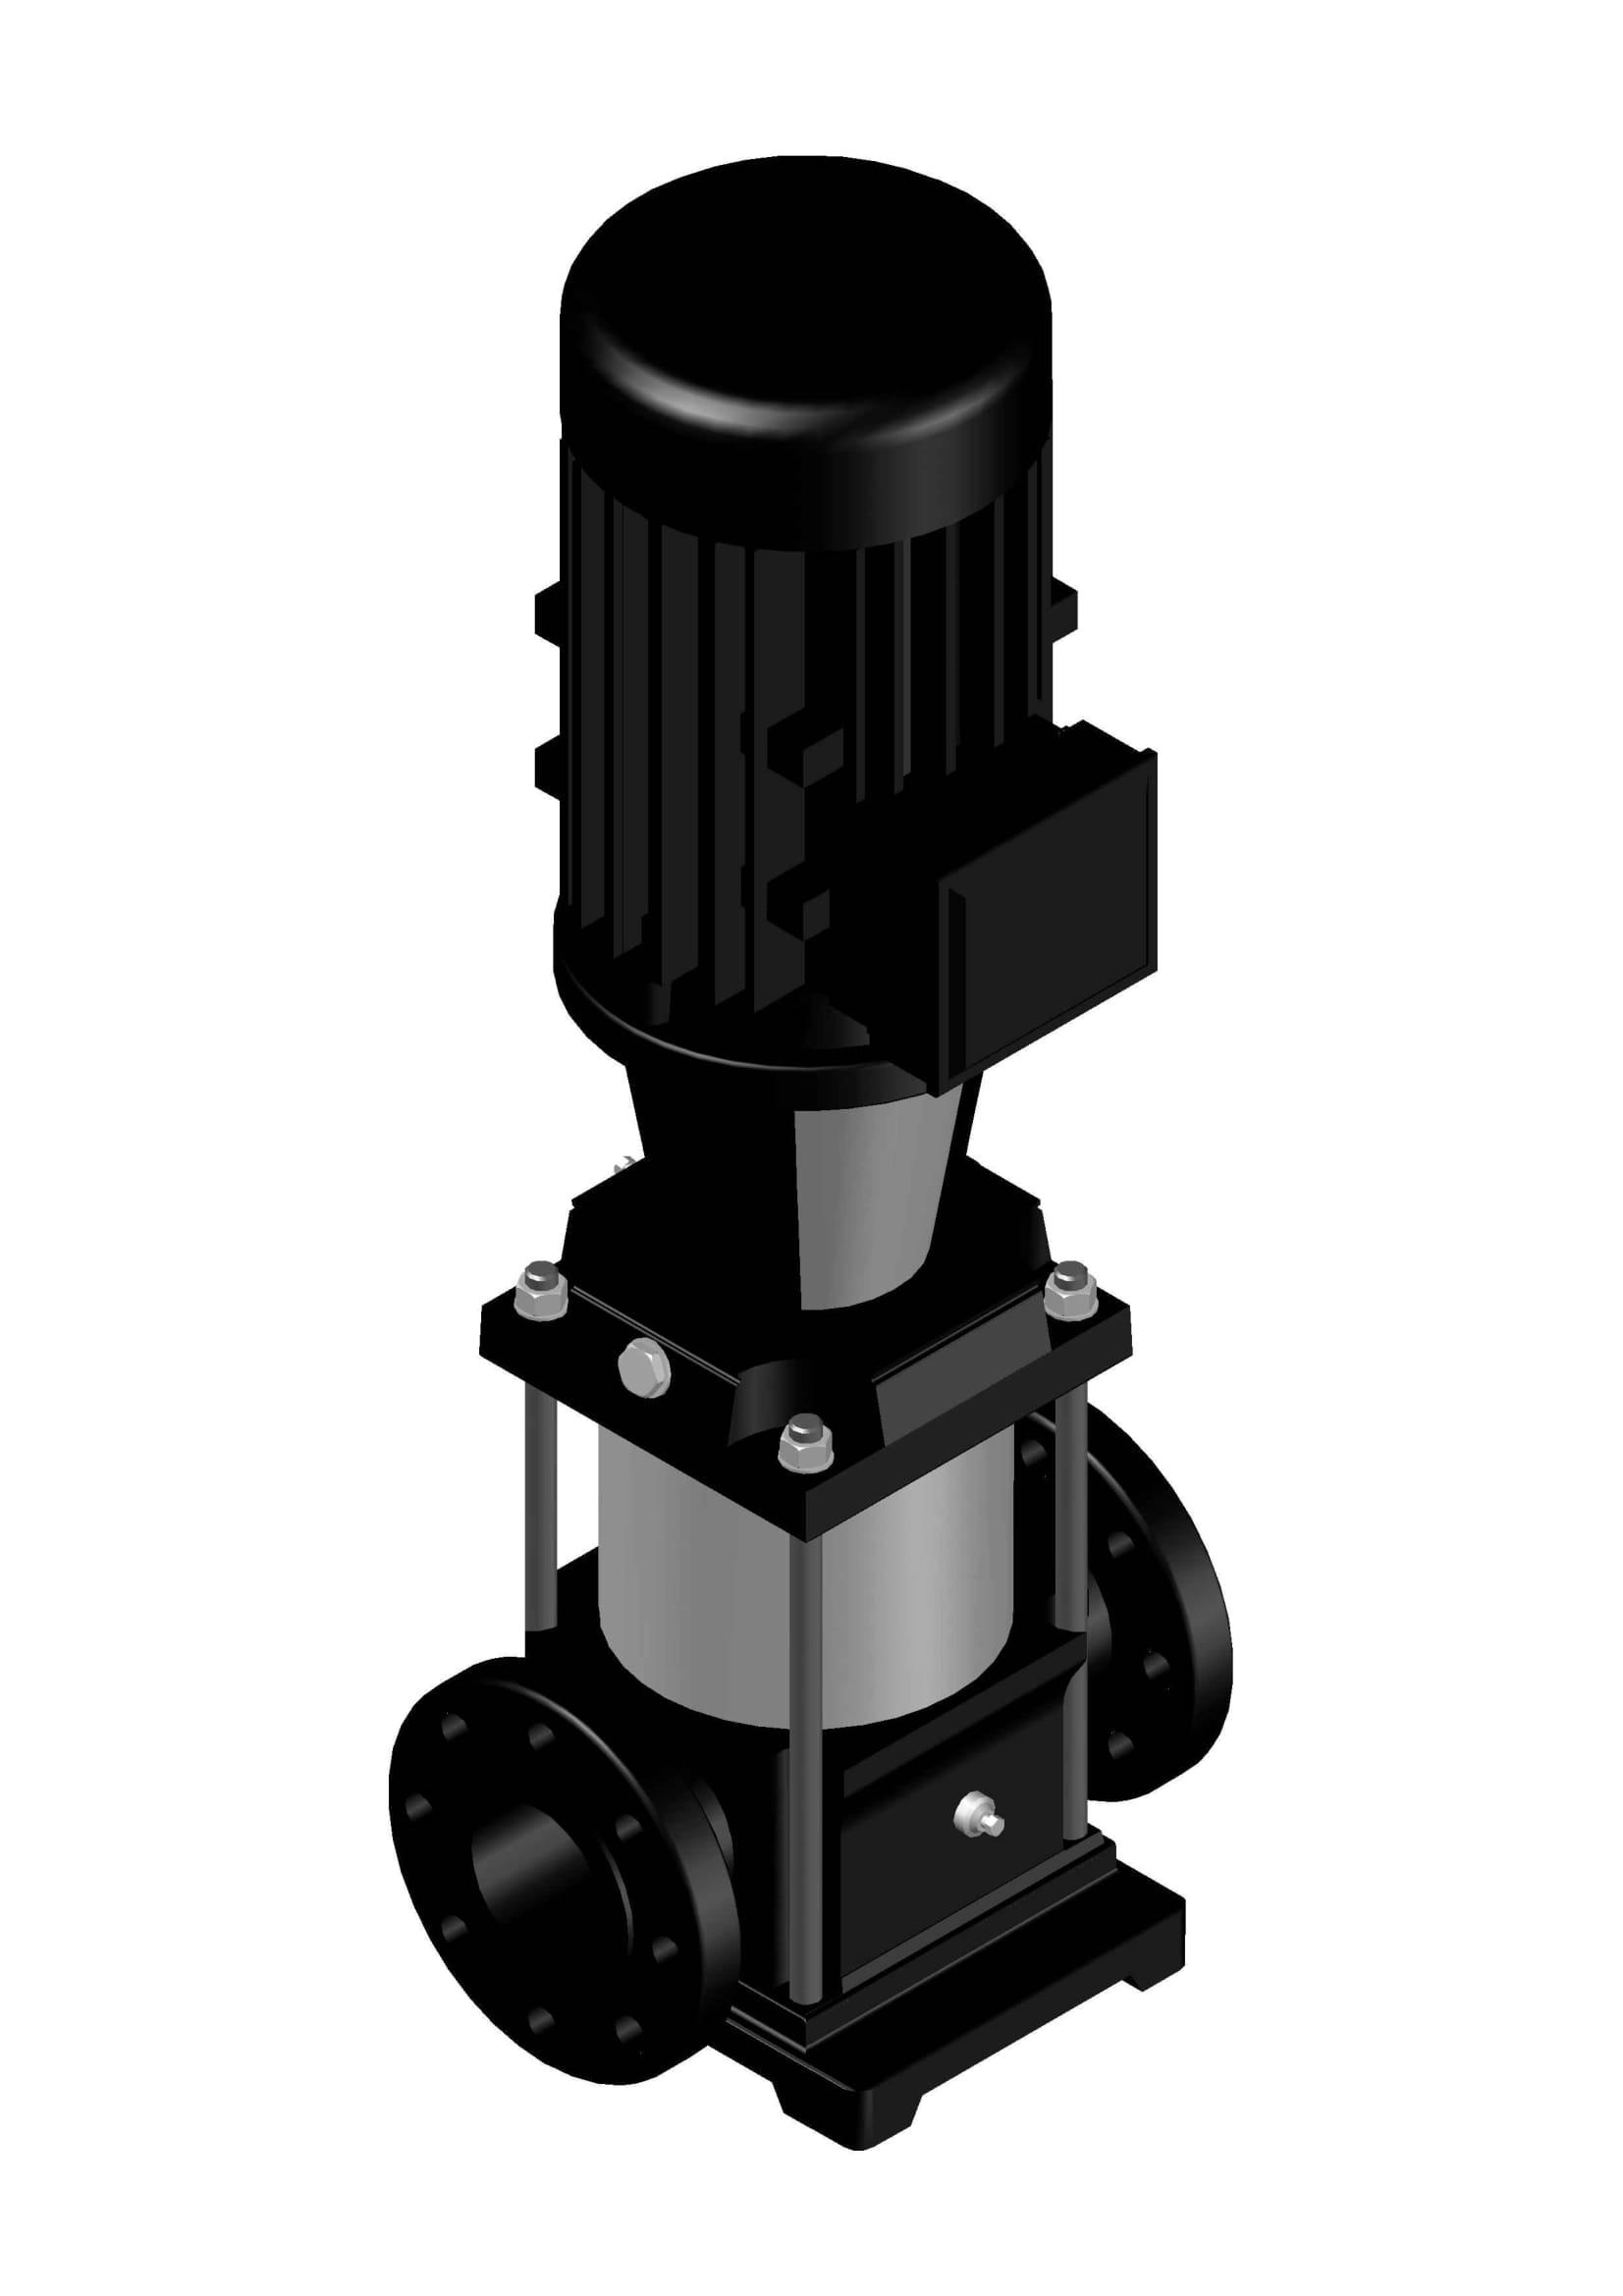 BV 64-02-02